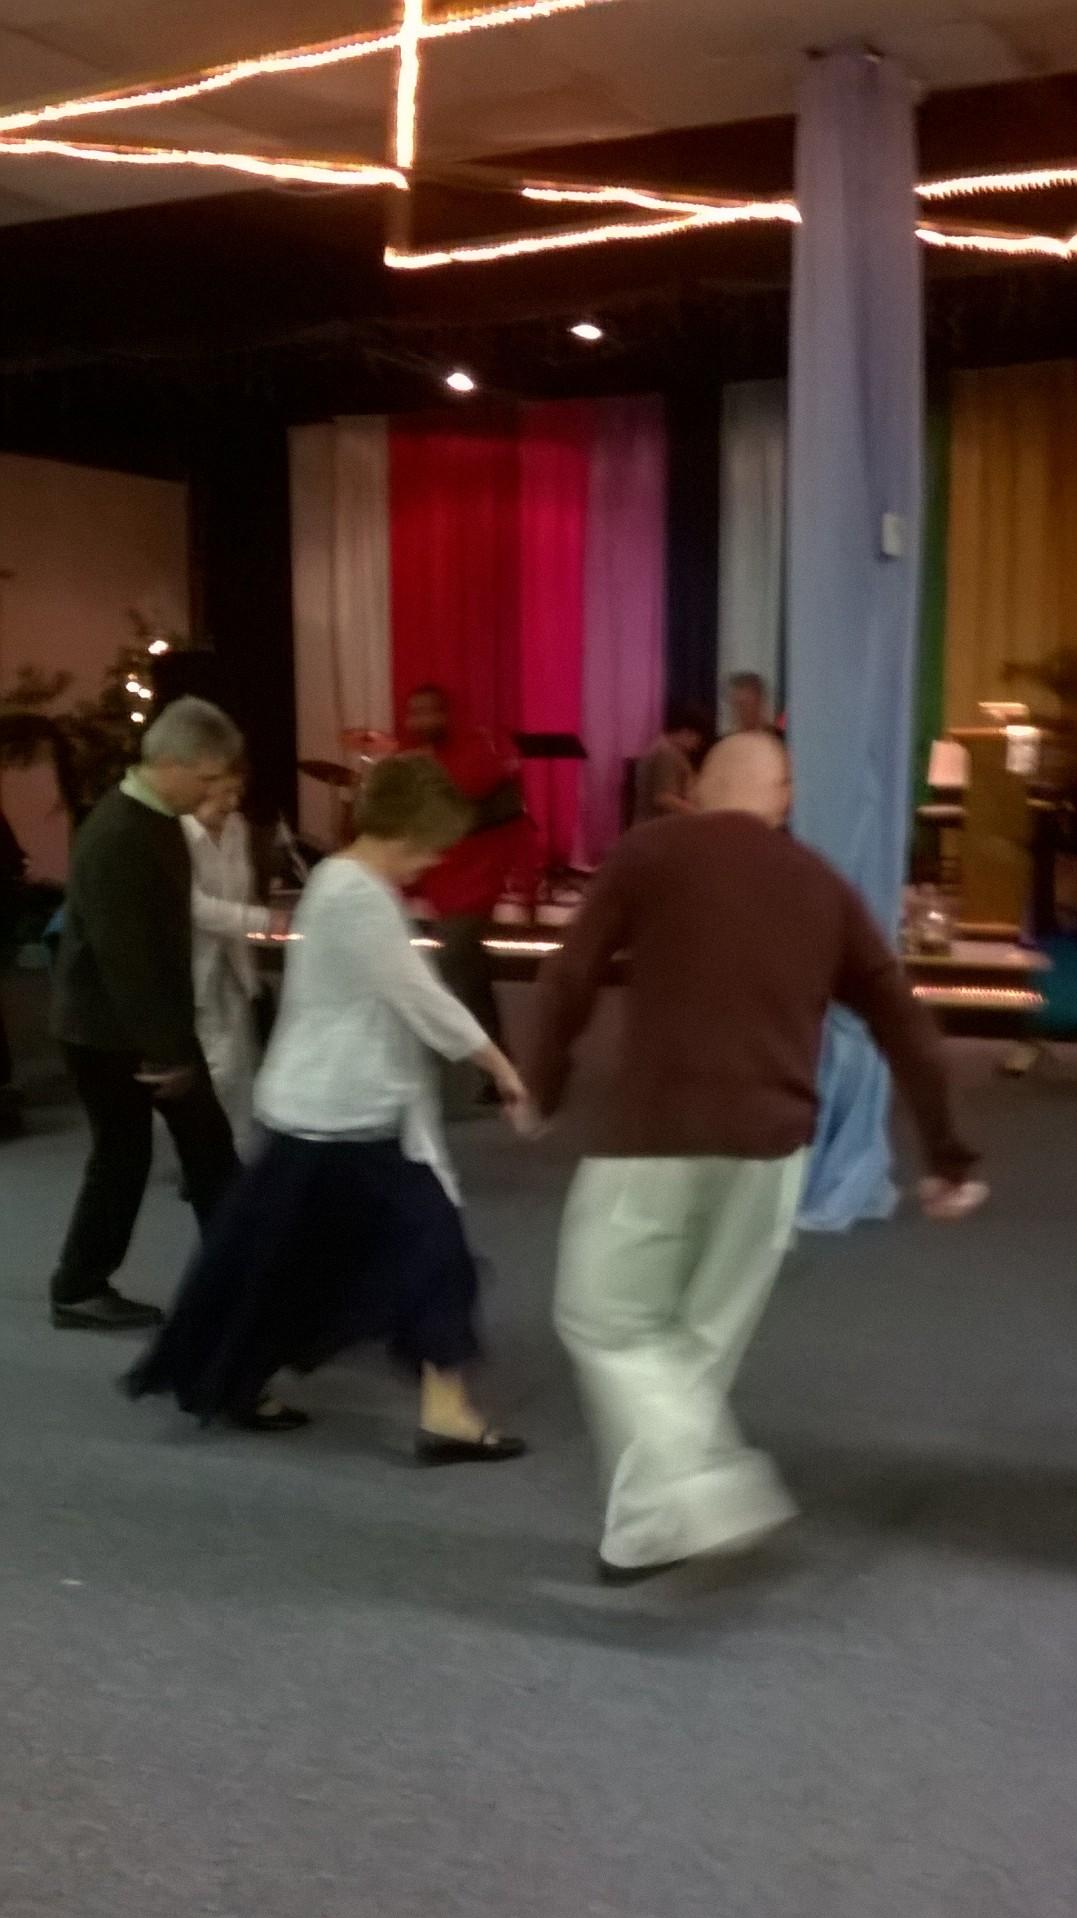 Dances on Shabbat